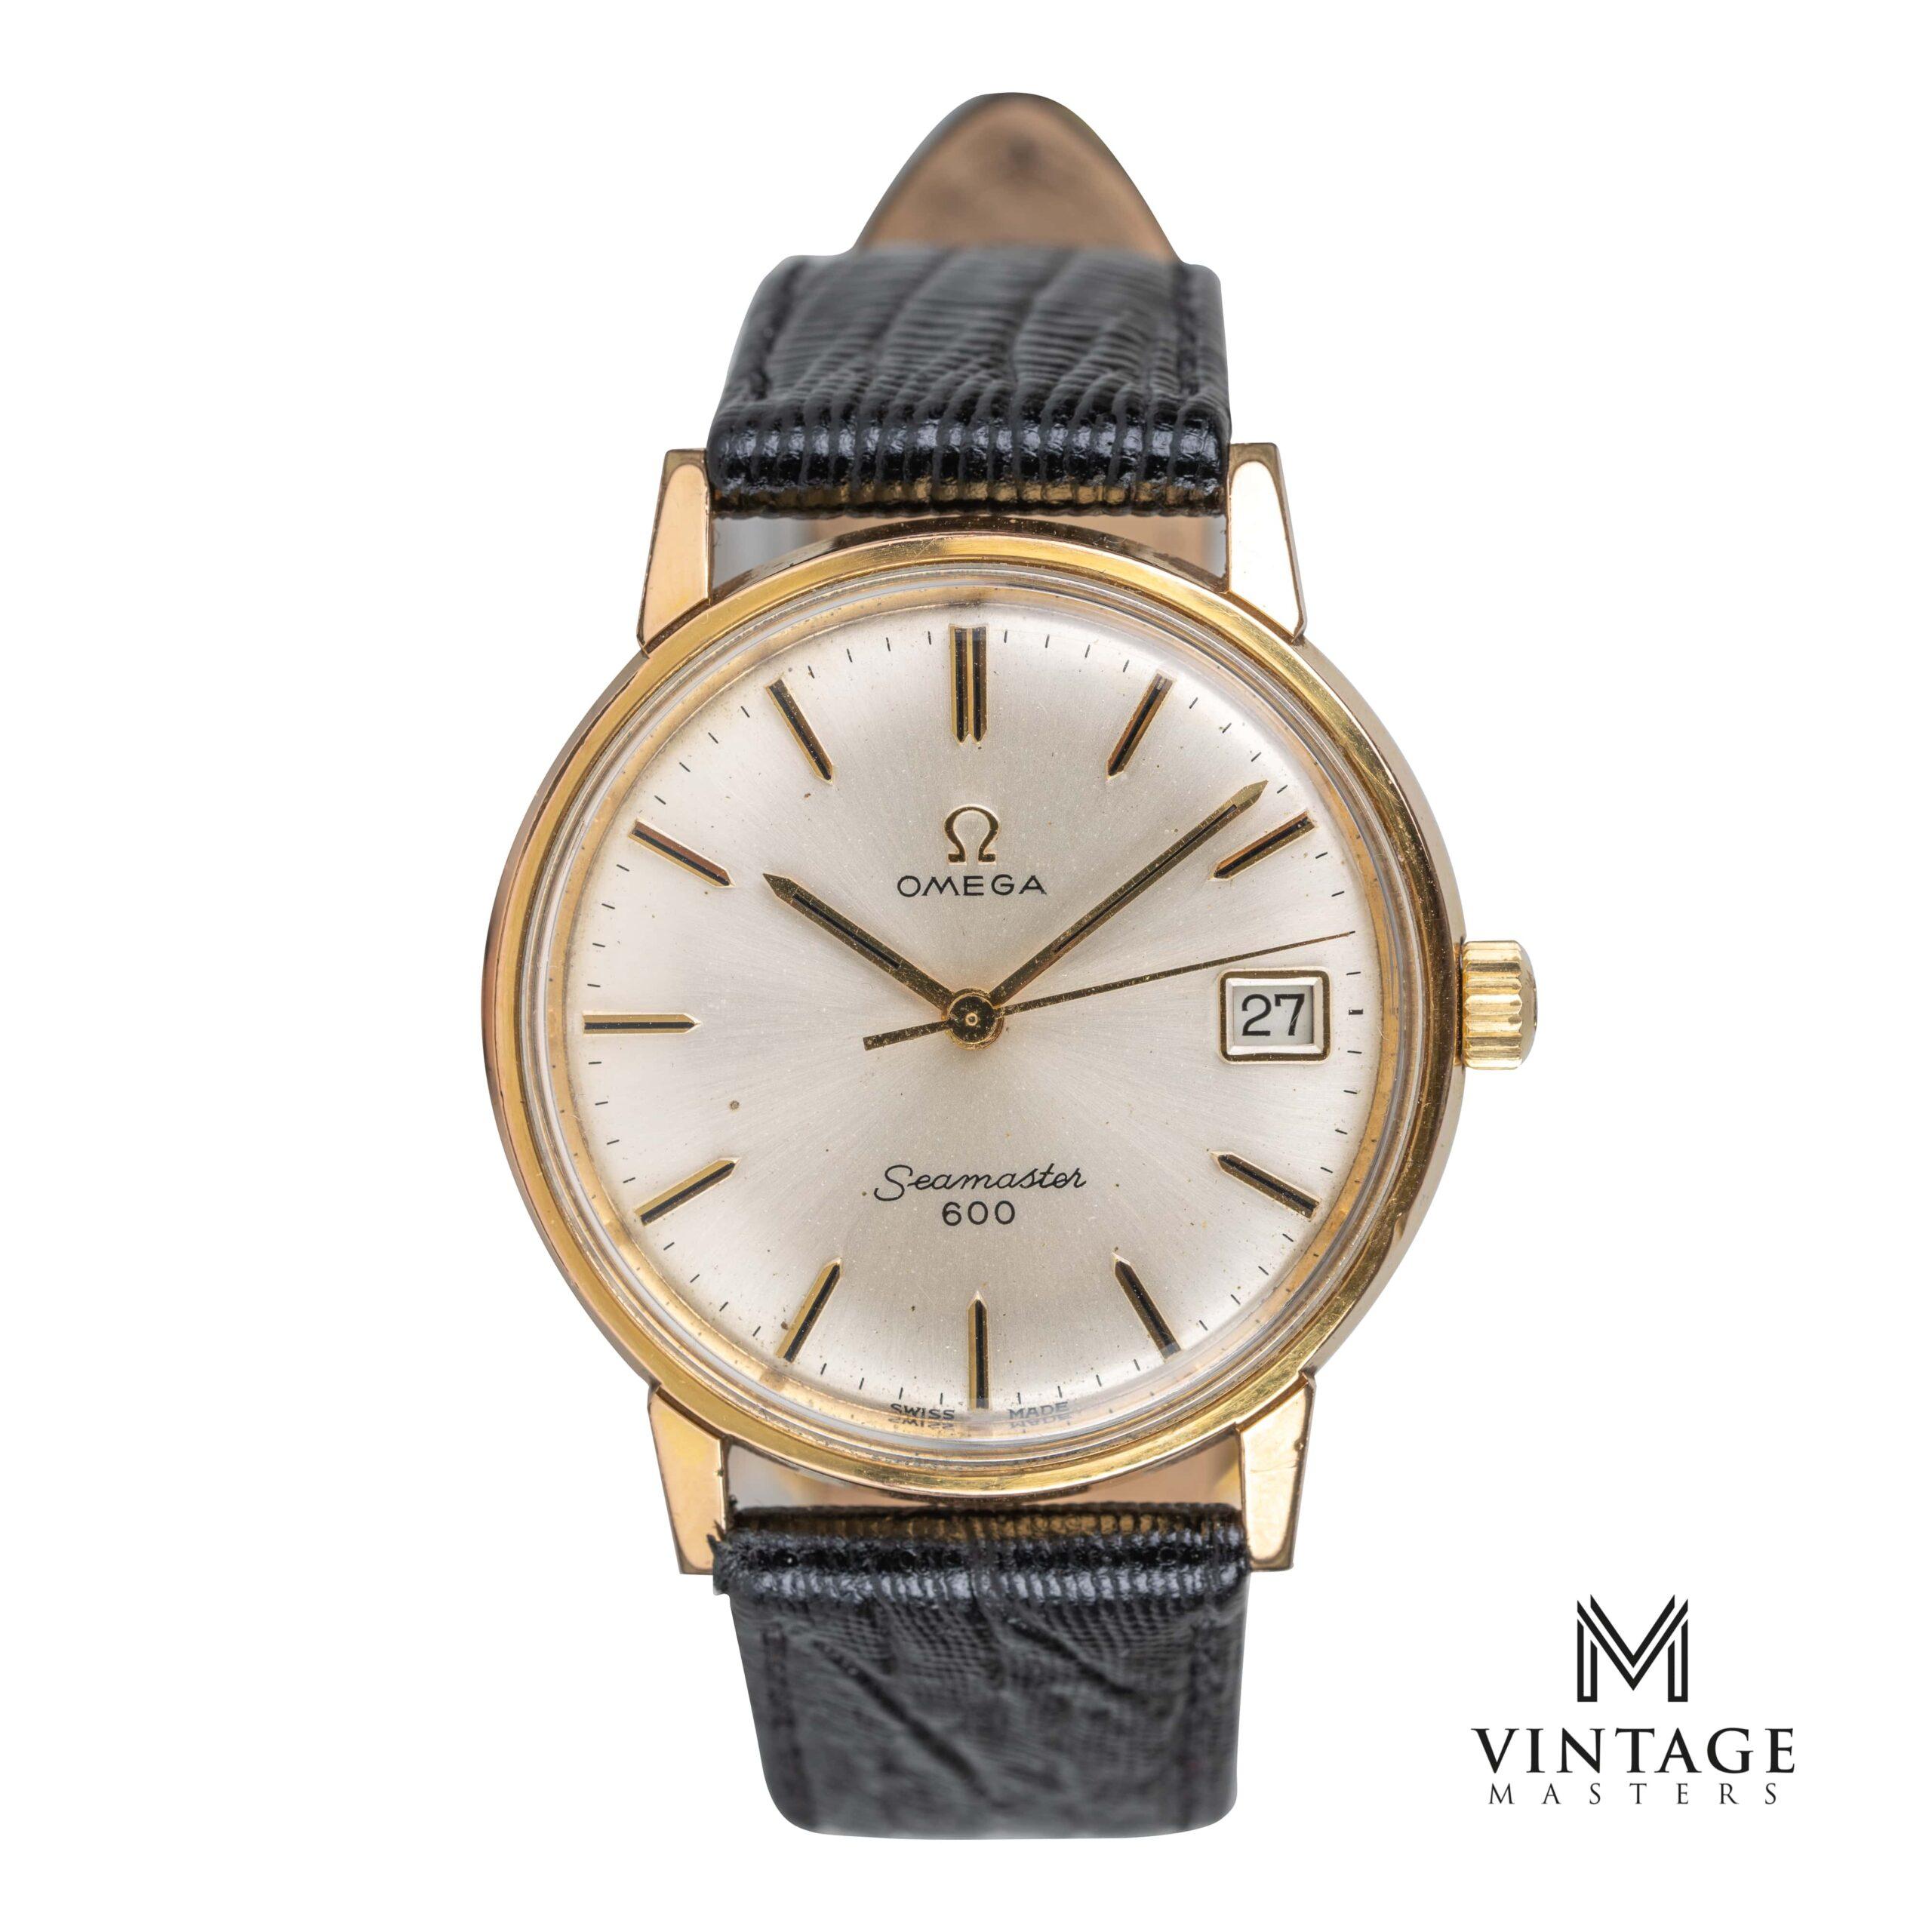 vintaeg omega seamaster 600 watch 136.011 1965 front